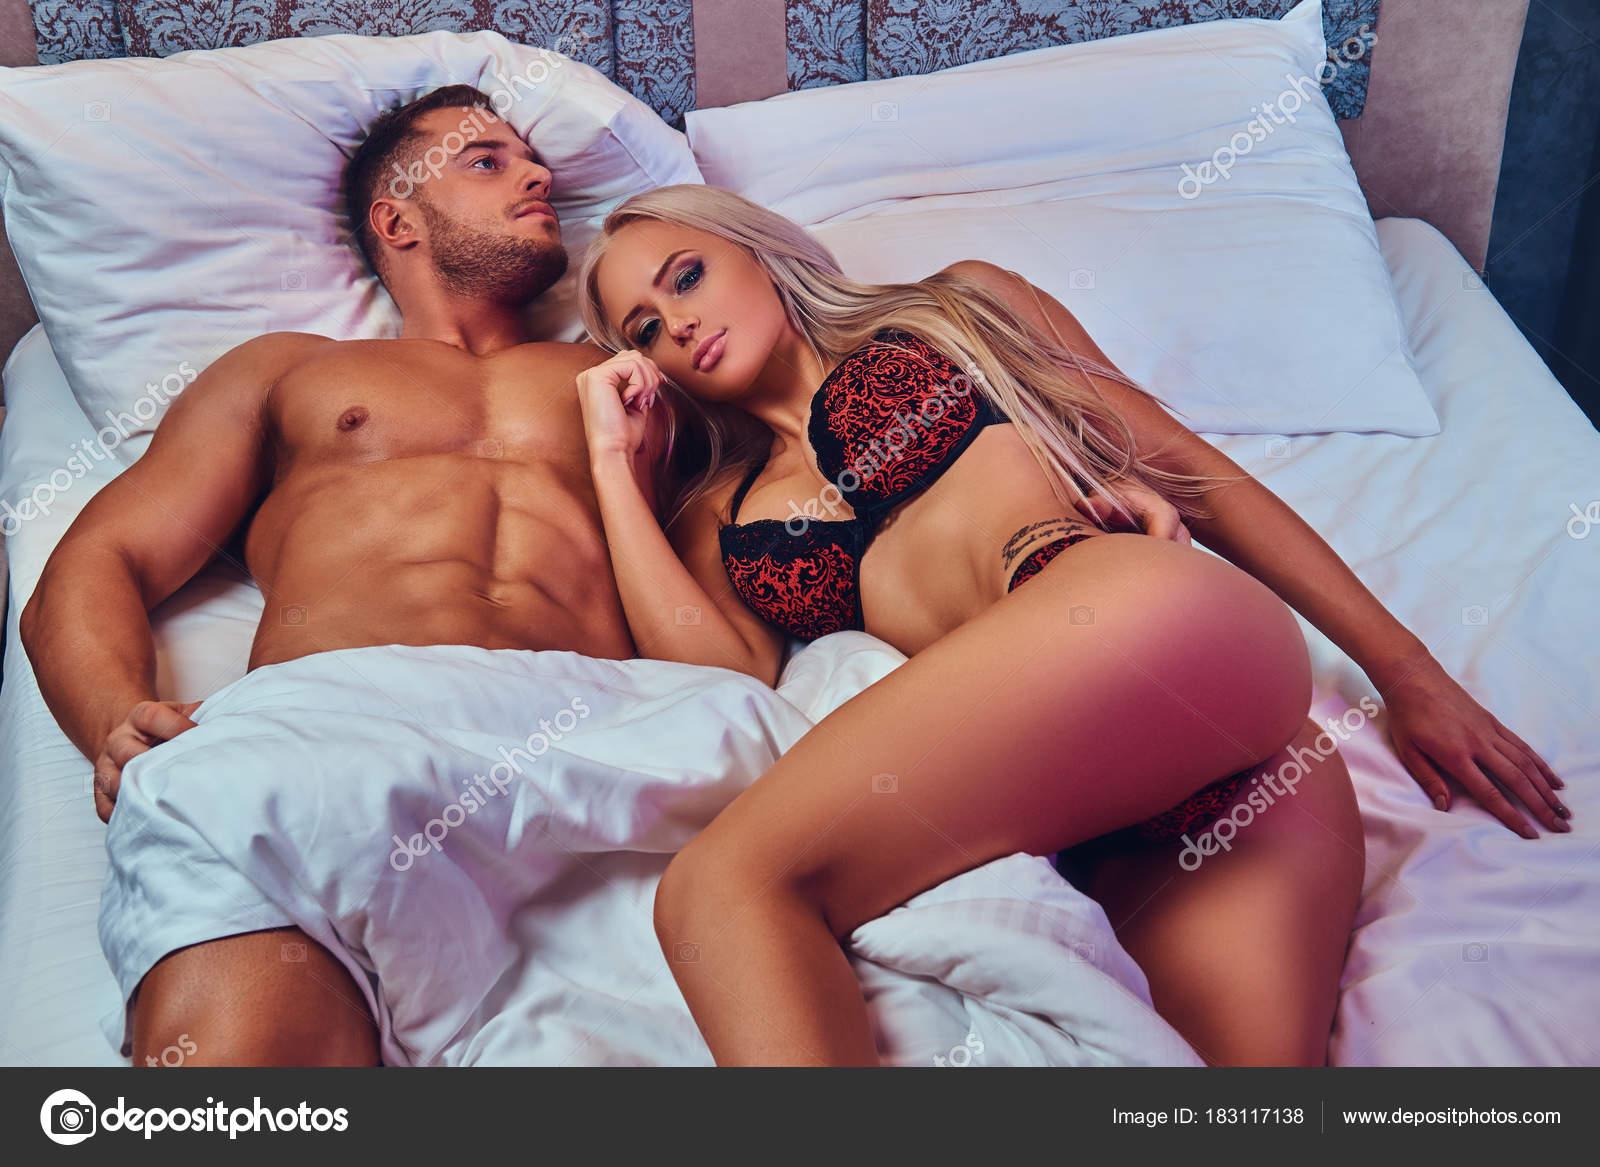 seksualniy-otdih-muzha-i-zheni-mobile